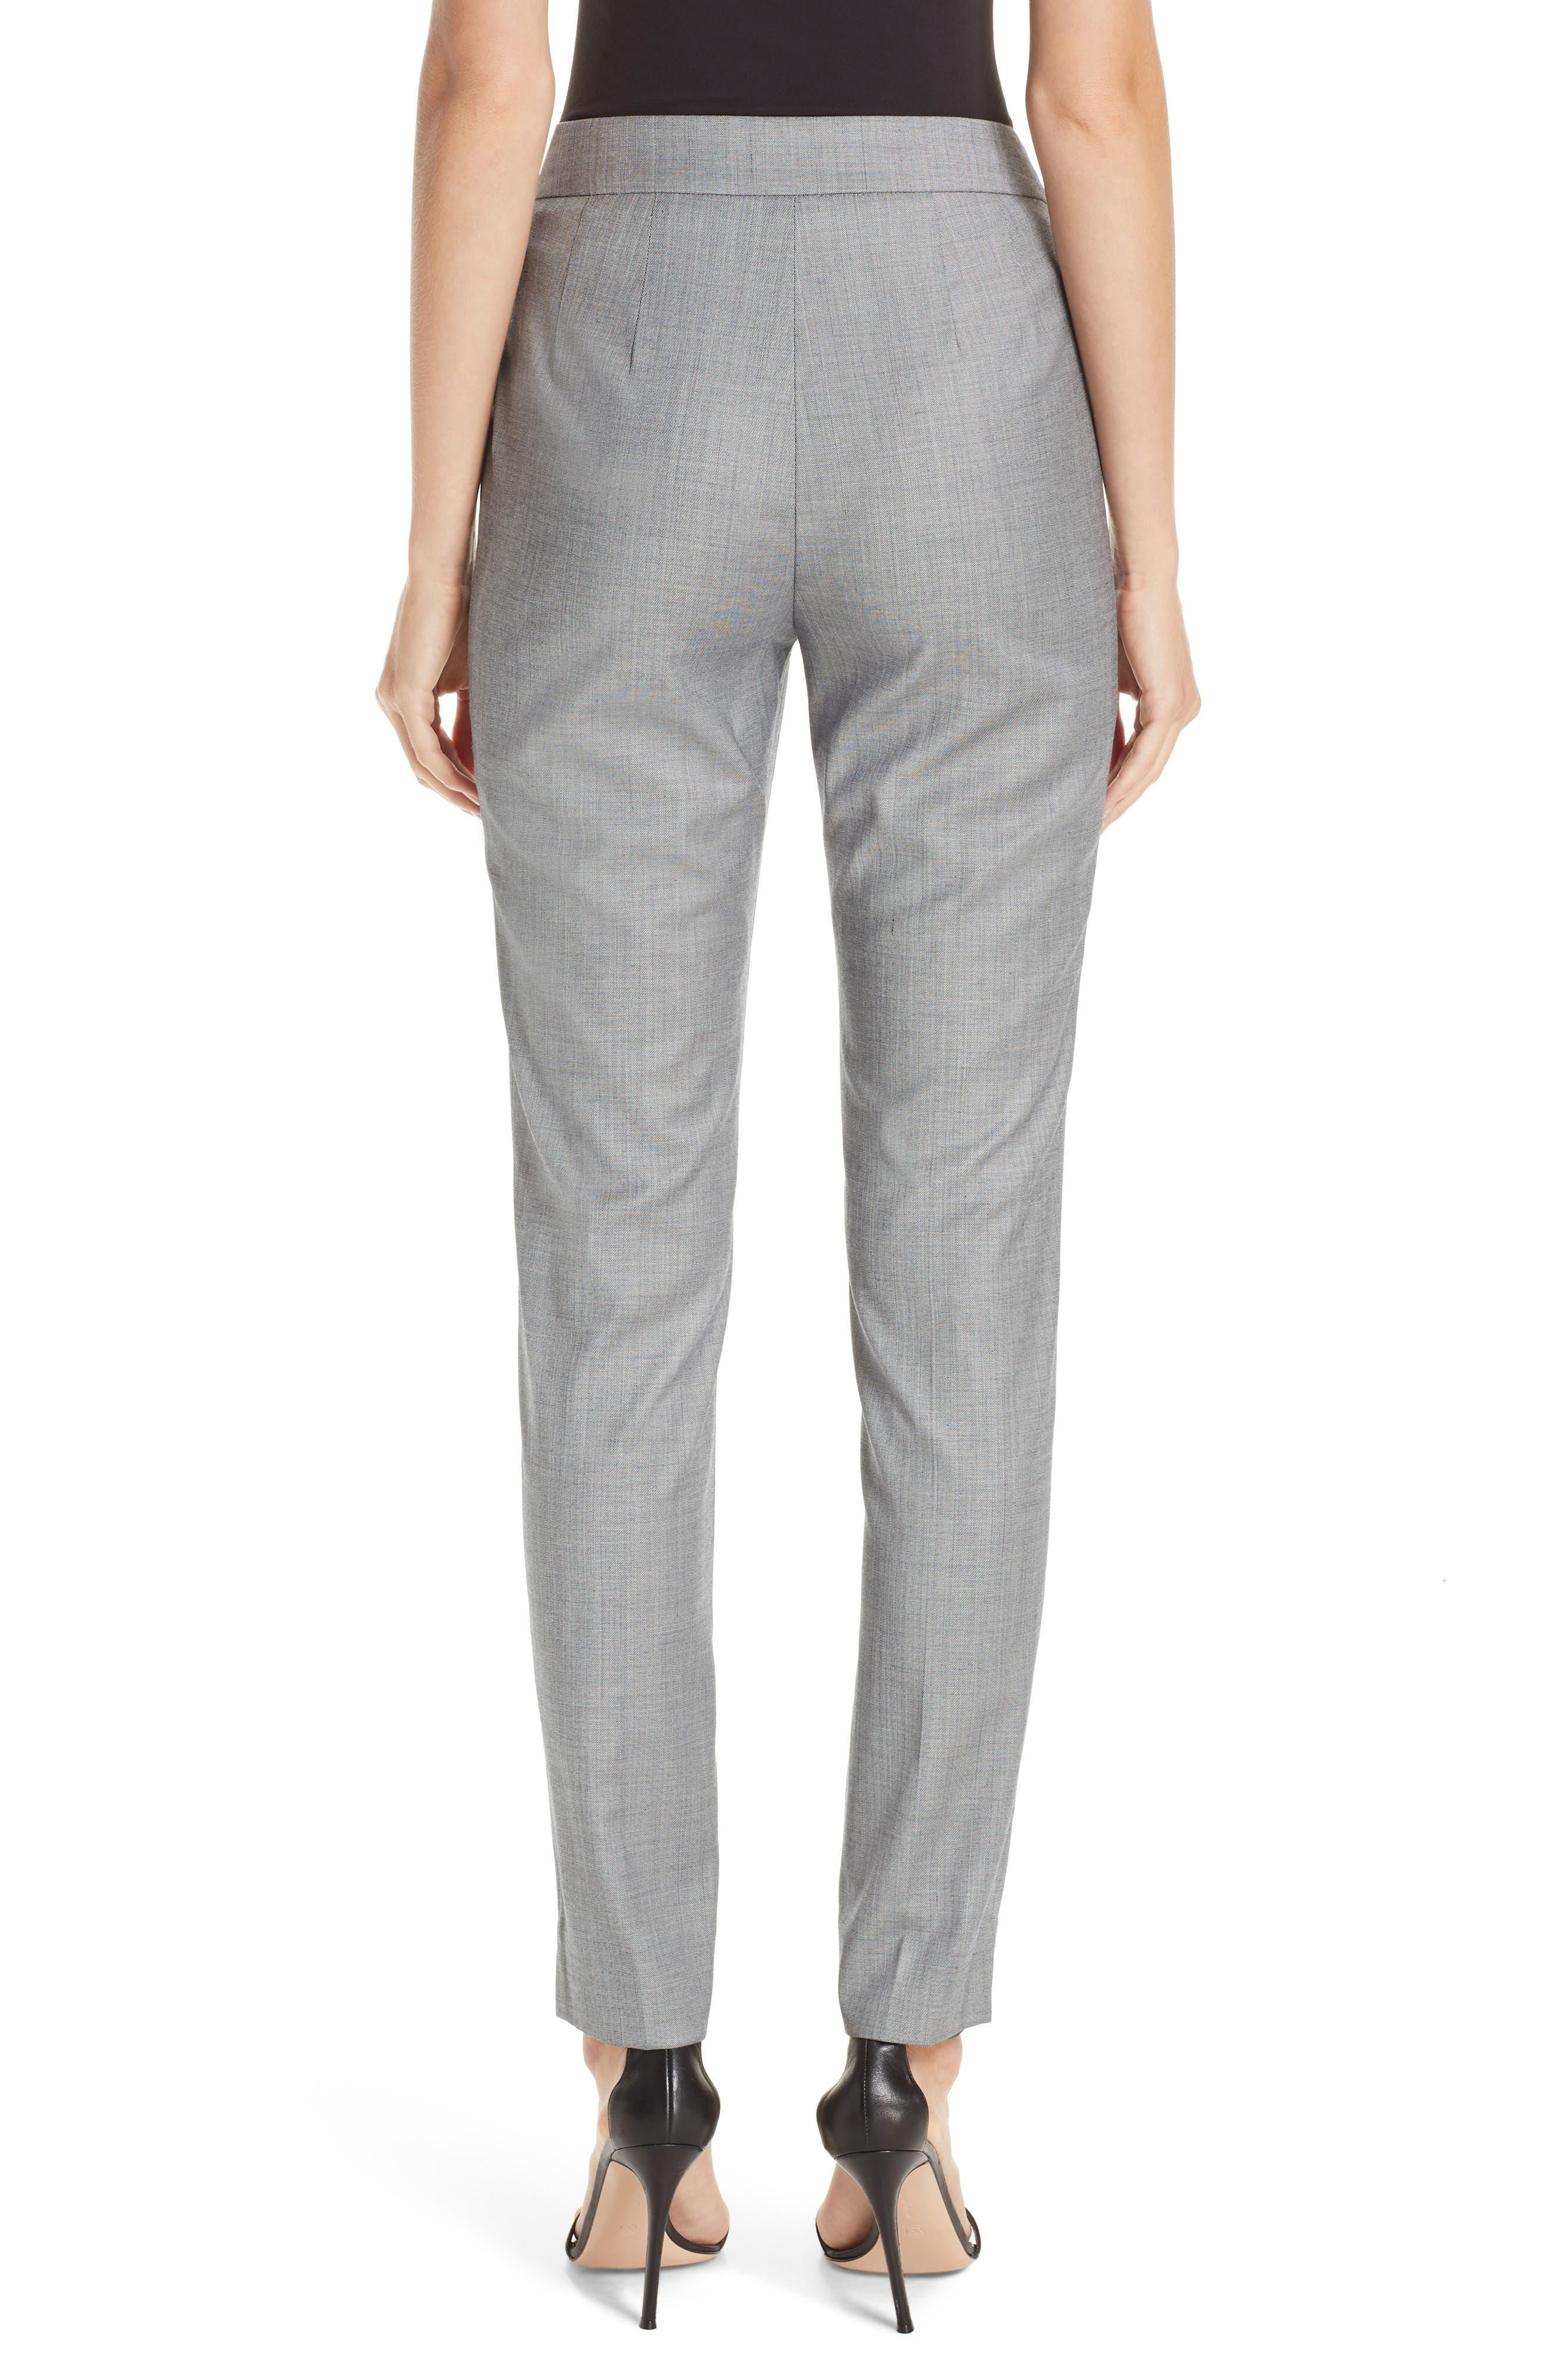 Sharkskin Stretch Wool Blend Skinny Ankle Pants,                             Alternate thumbnail 2, color,                             GREY MULTI